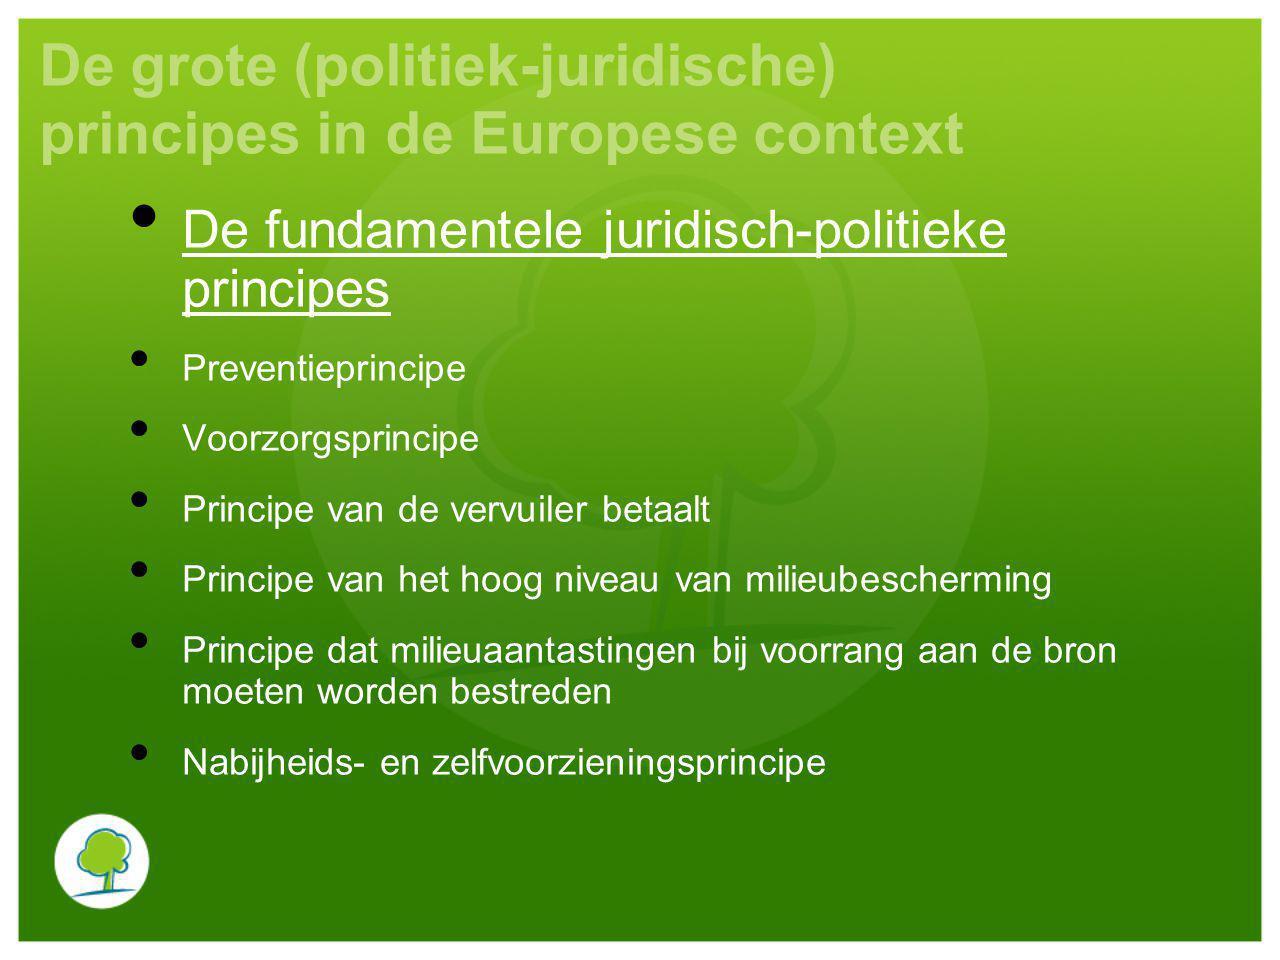 De grote (politiek-juridische) principes in de Europese context De fundamentele juridisch-politieke principes Preventieprincipe Voorzorgsprincipe Prin